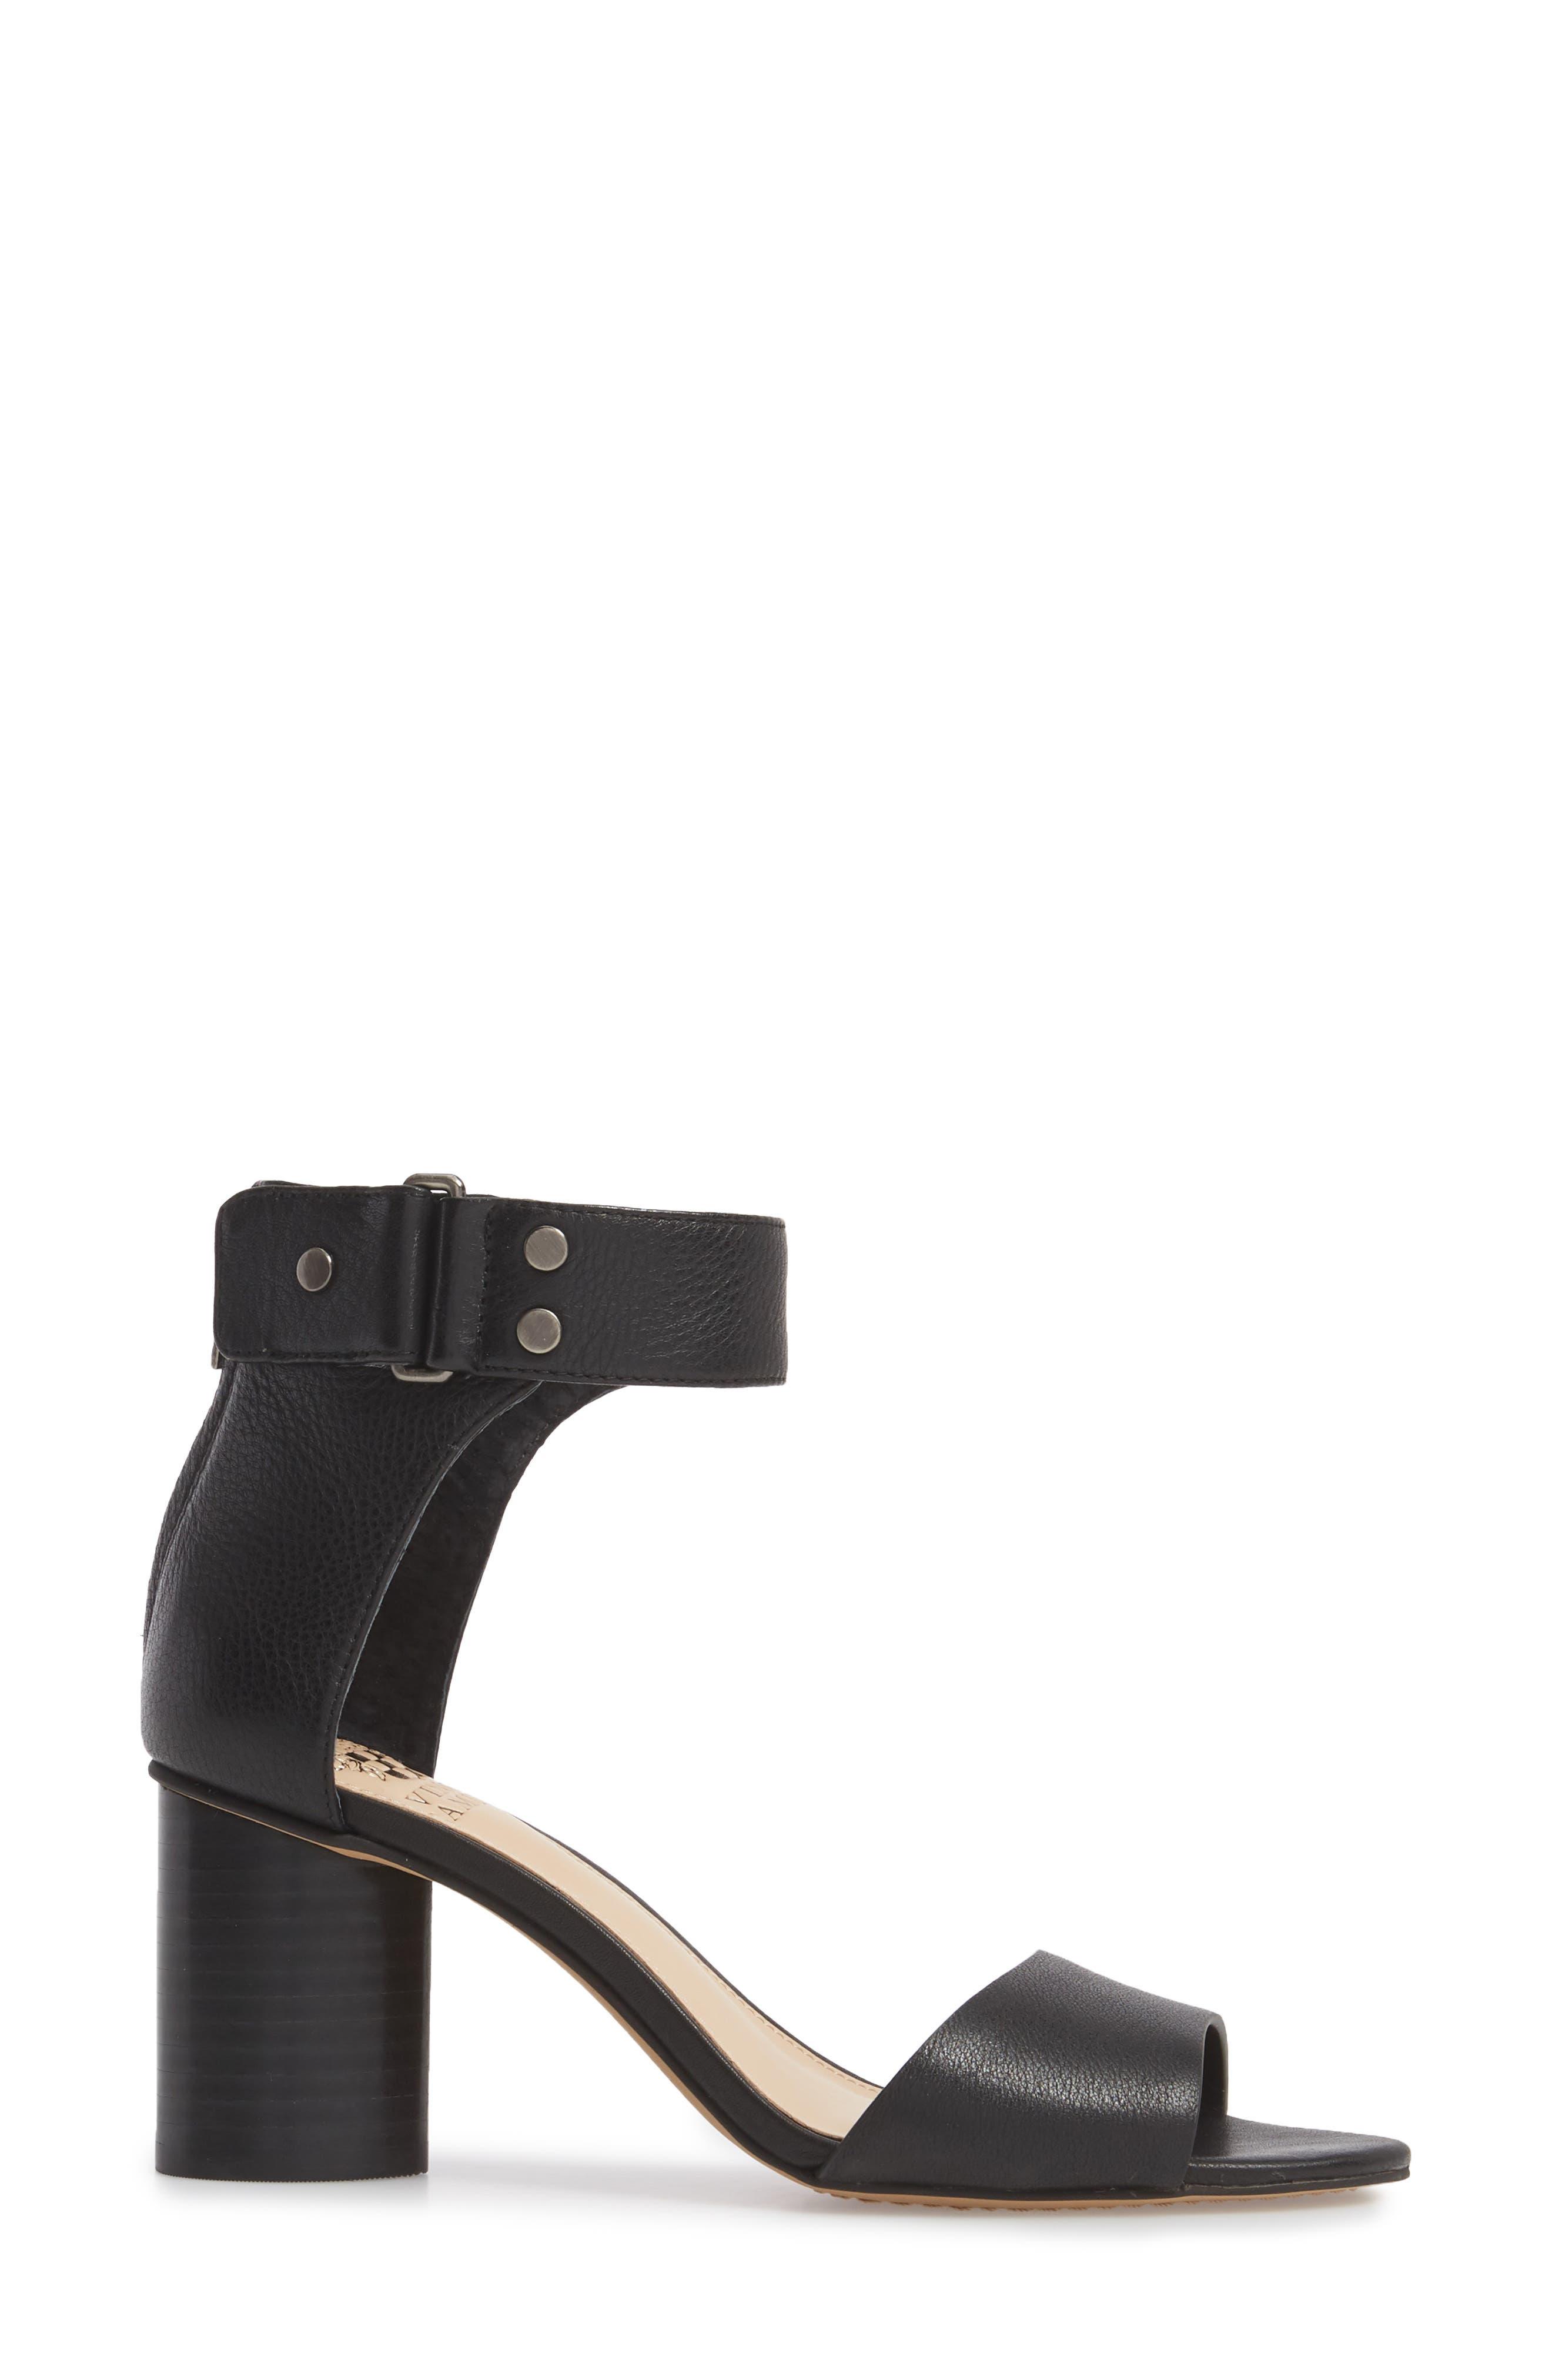 Jannali Ankle Strap Sandal,                             Alternate thumbnail 3, color,                             BLACK LEATHER